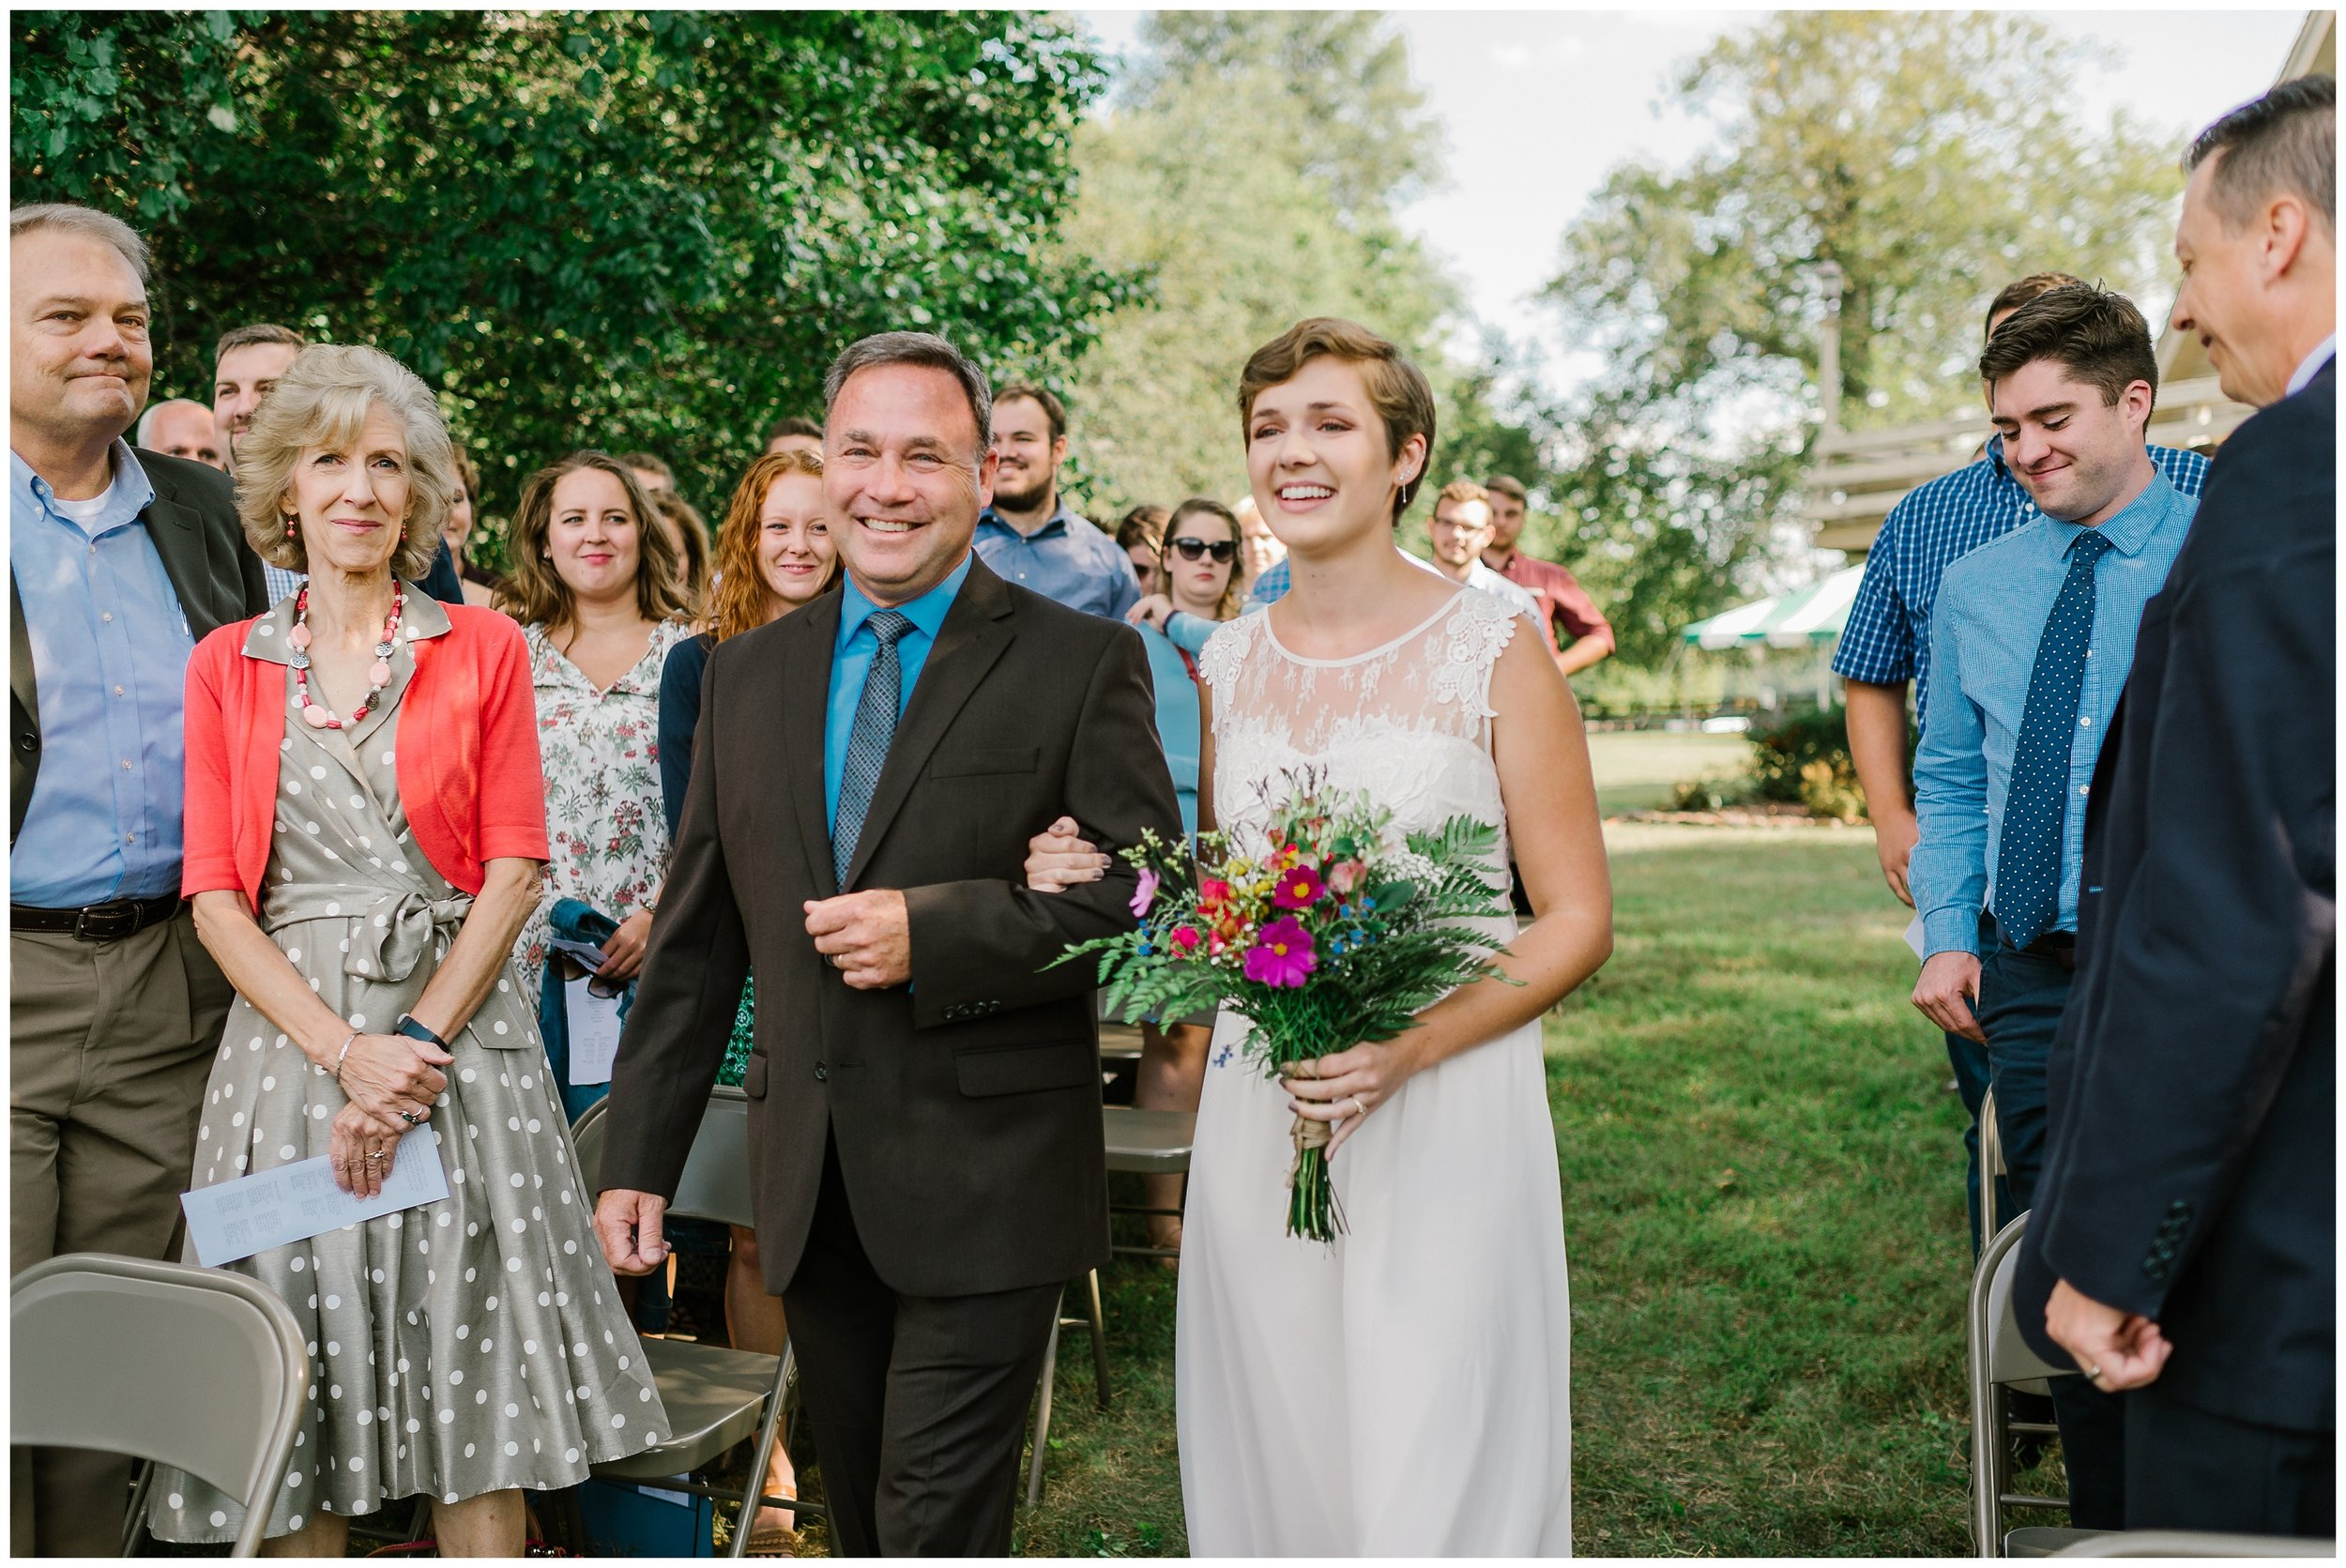 Rebecca_Shehorn_Photography_Indianapolis_Wedding_Photographer_7247.jpg